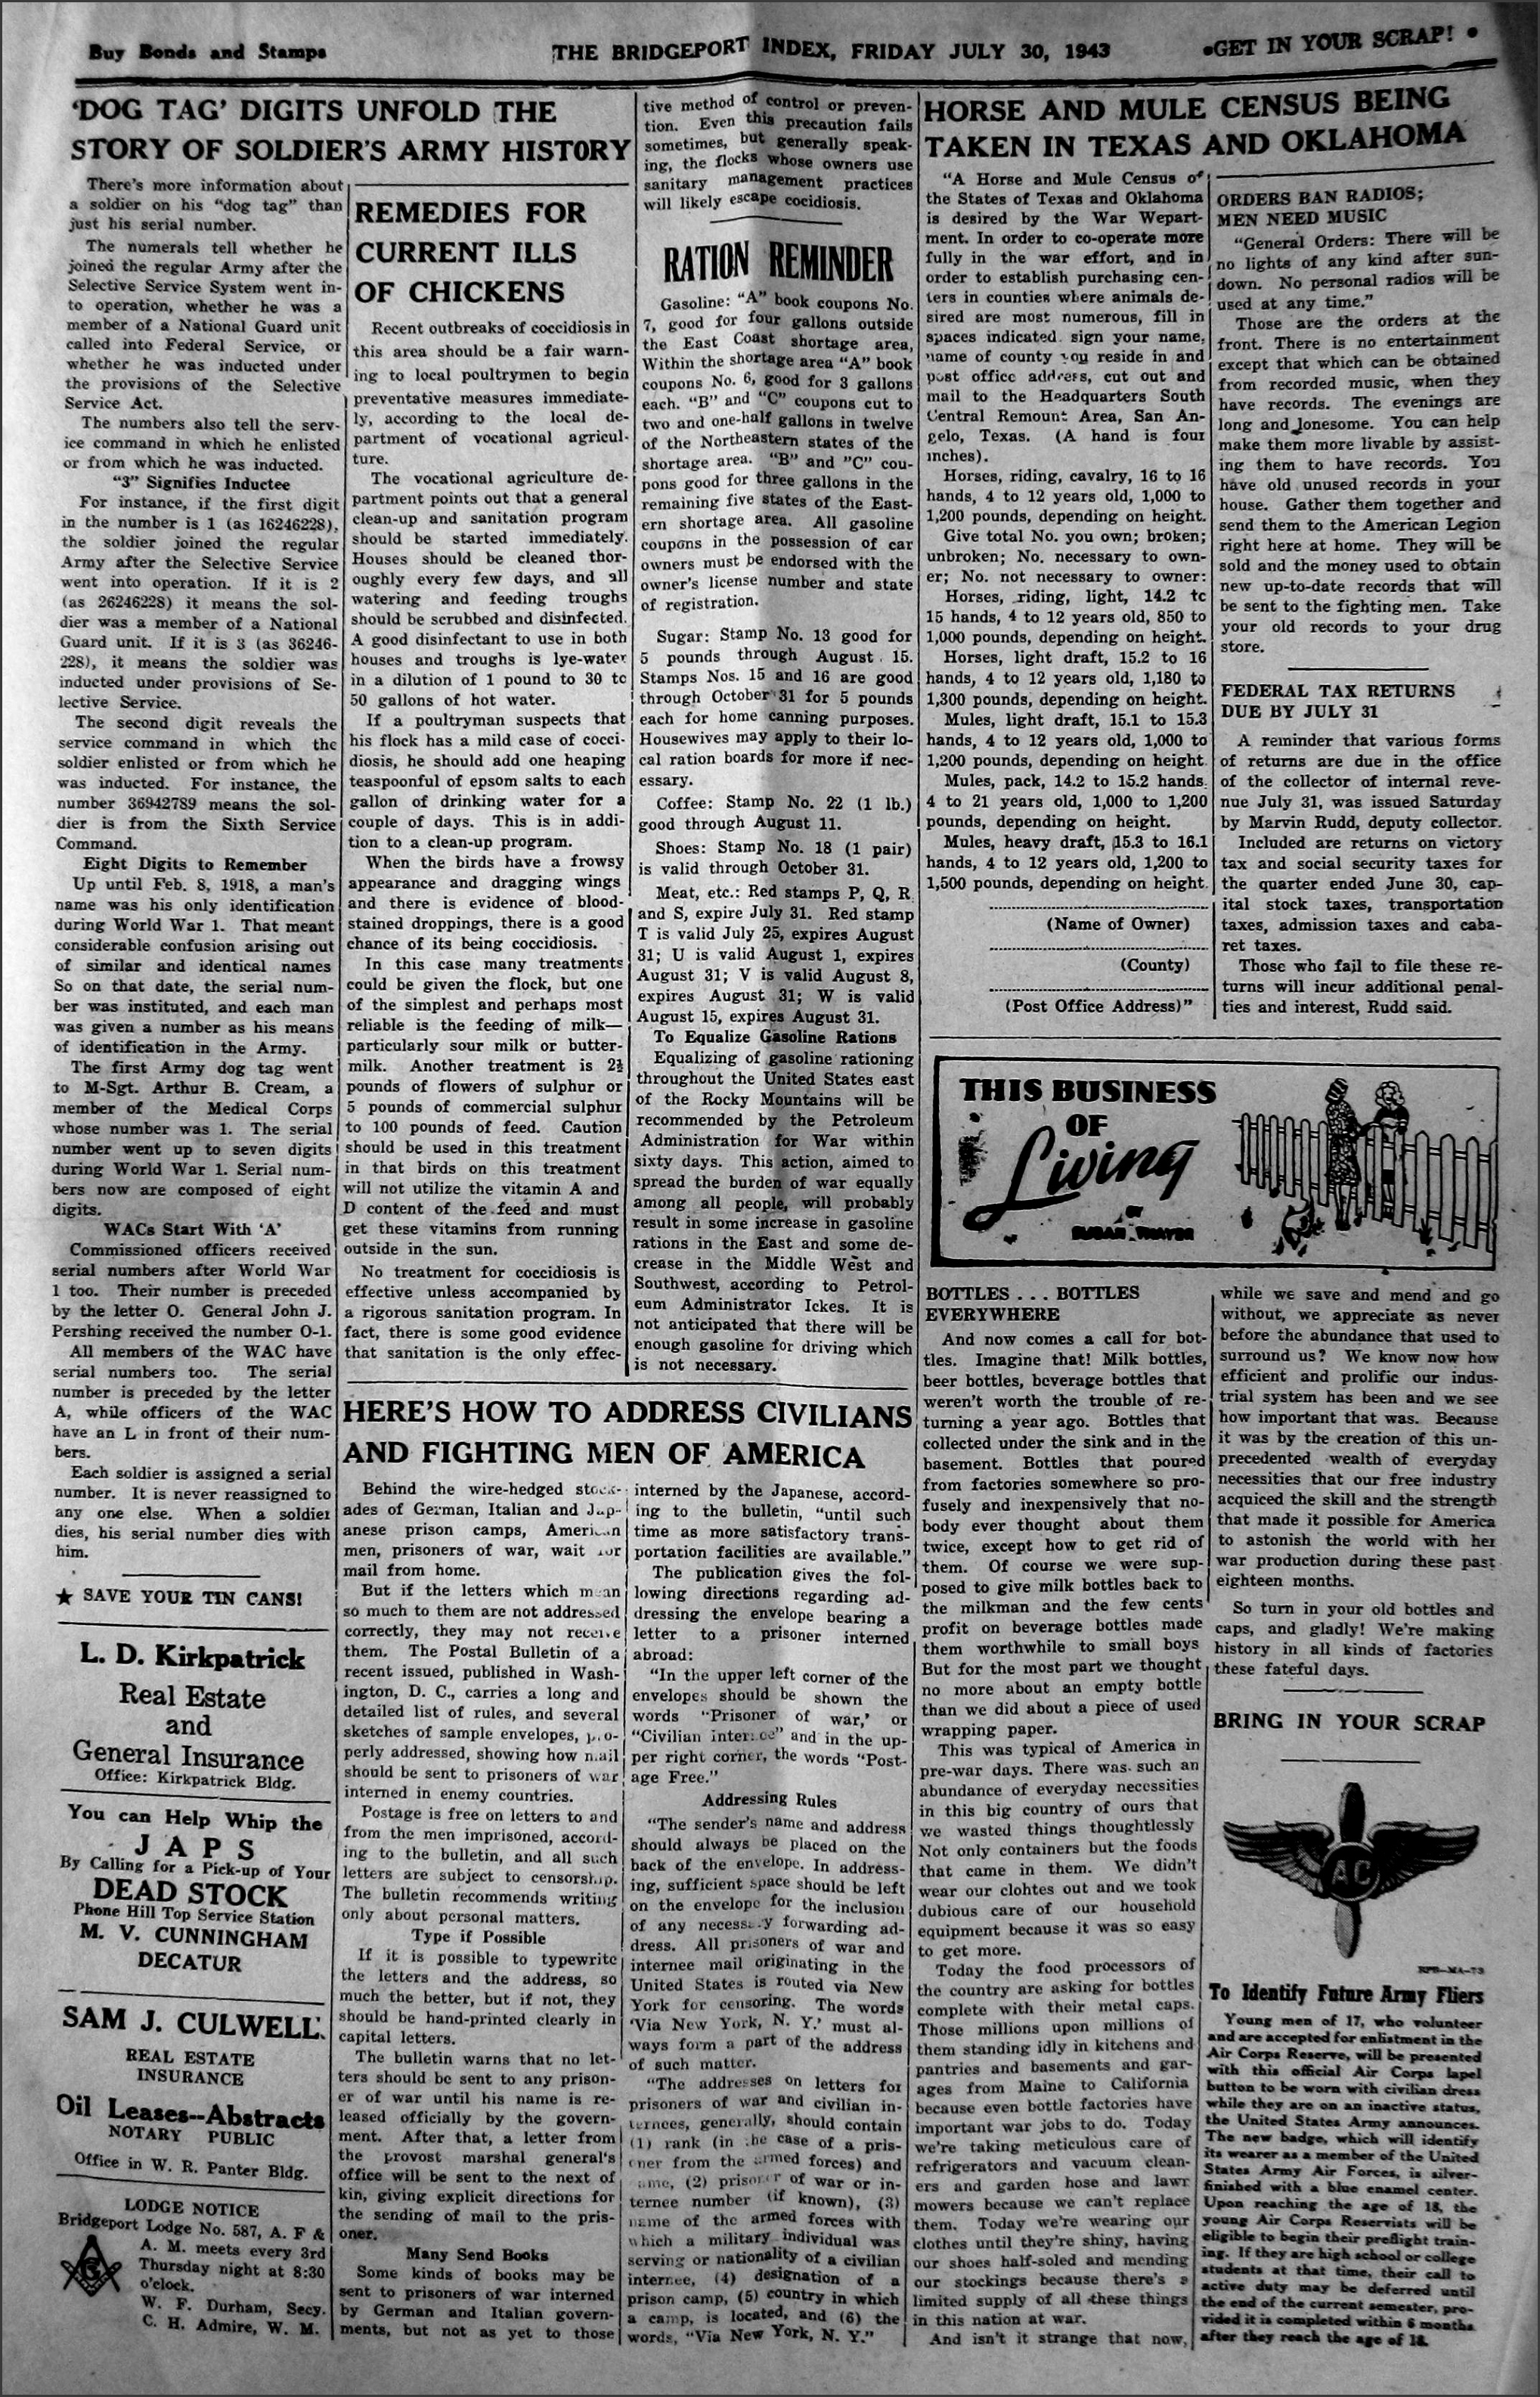 draft regulations questions news 1942 12 25 pg02 Â dunn george luther selma esther elsie mann wedding 1943 10 08 pg02 Â duryea florence mrs obituary